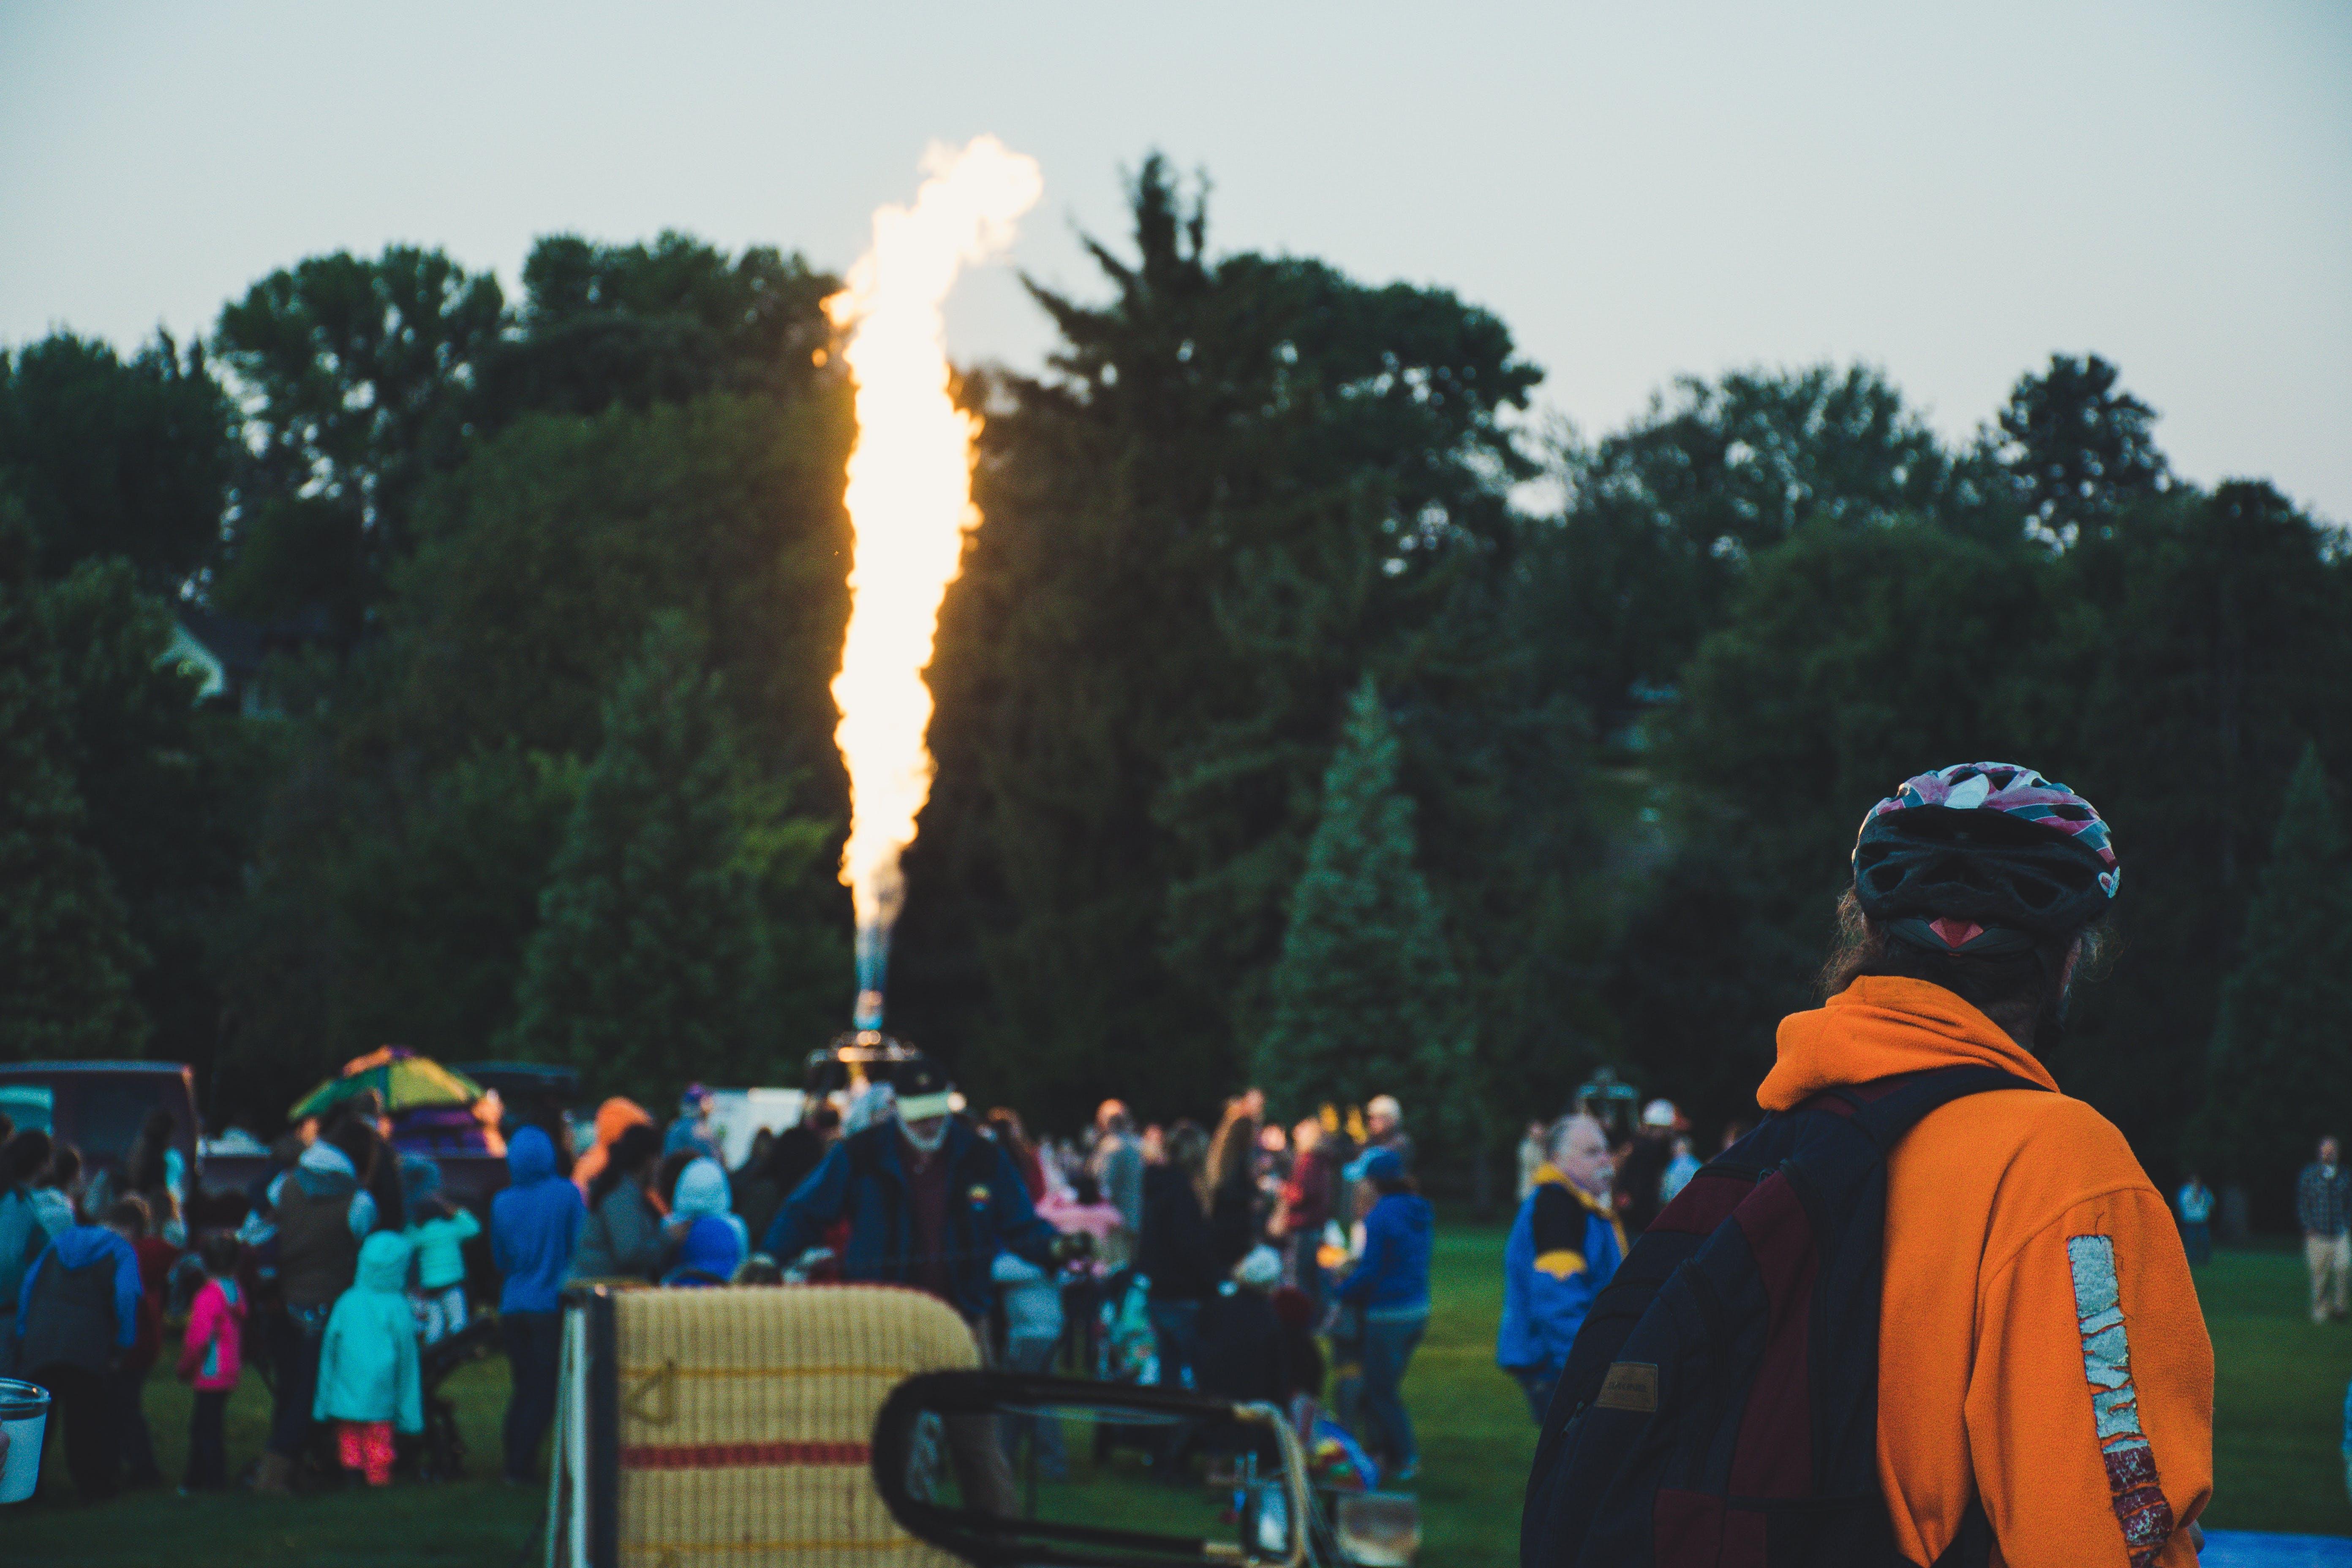 People Gathered Around Machine That Emits Flame